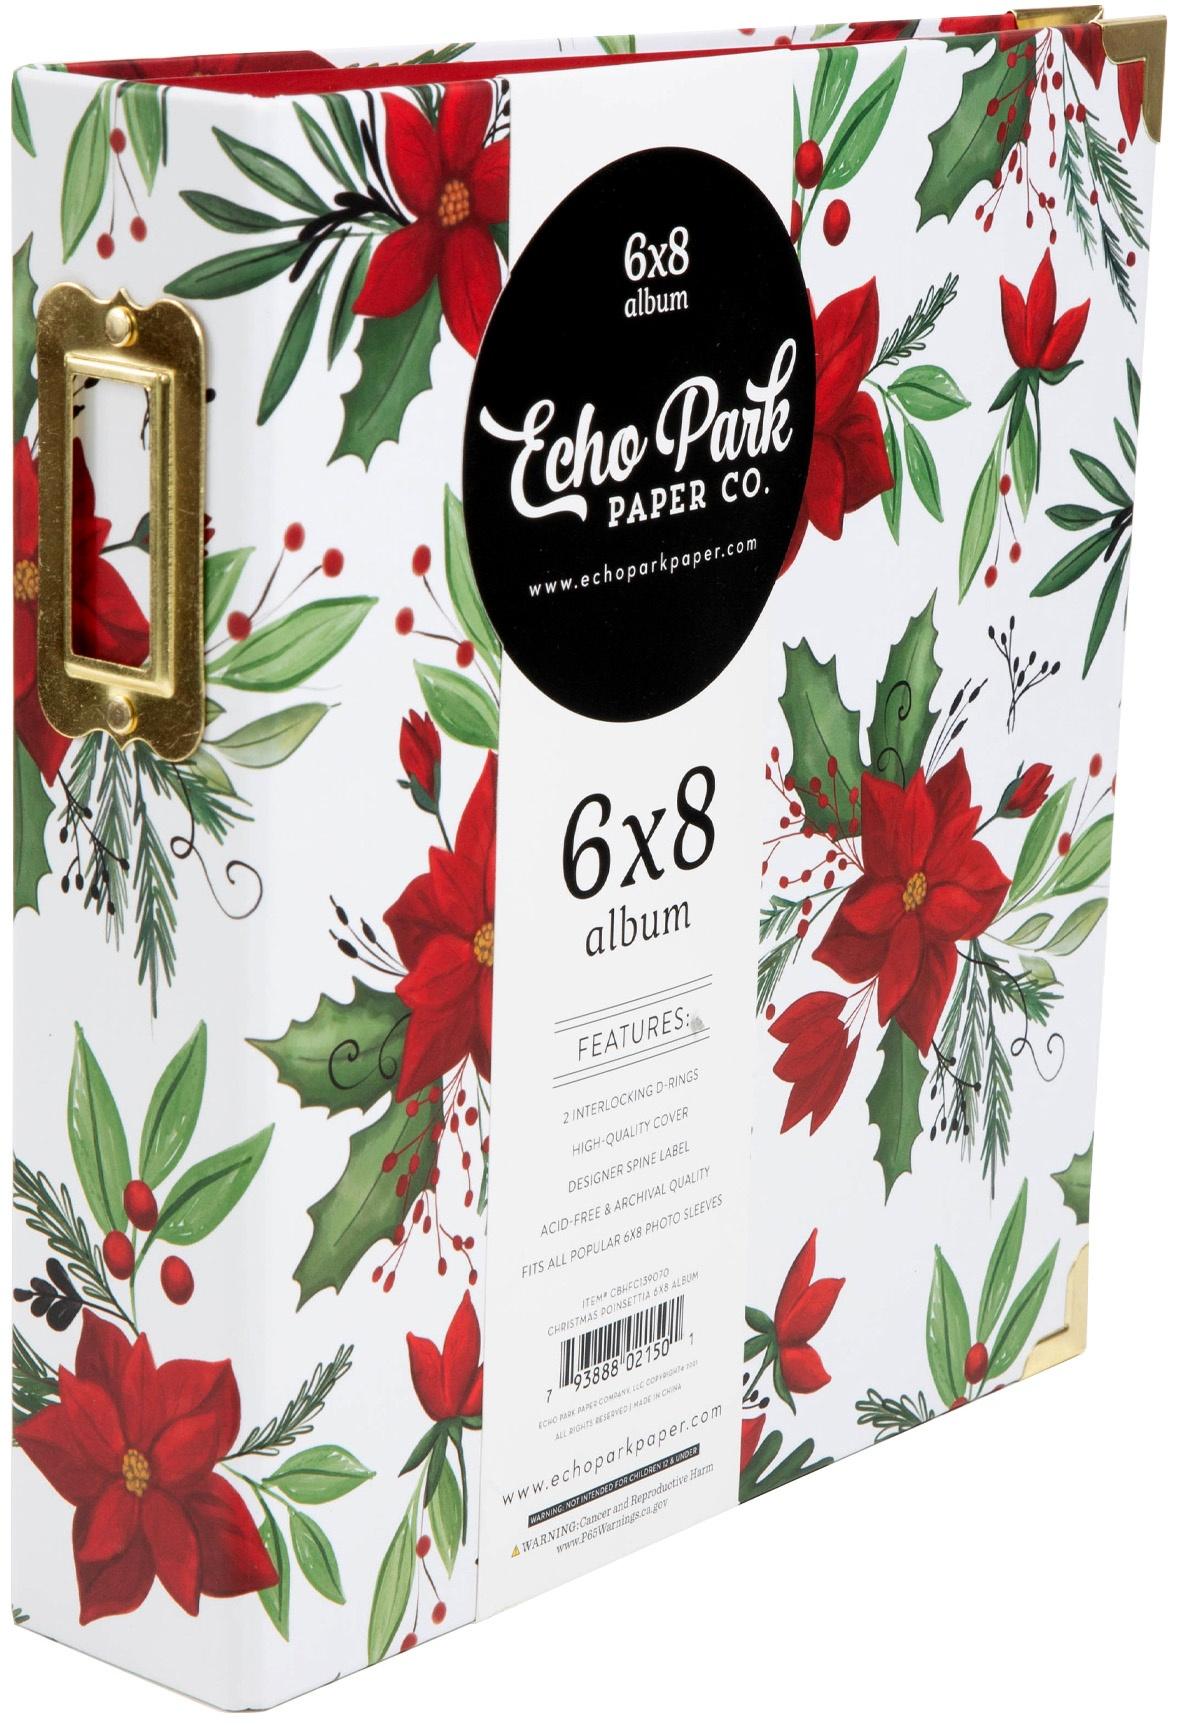 Echo Park - 6x8 Album - Christmas Poinsettia